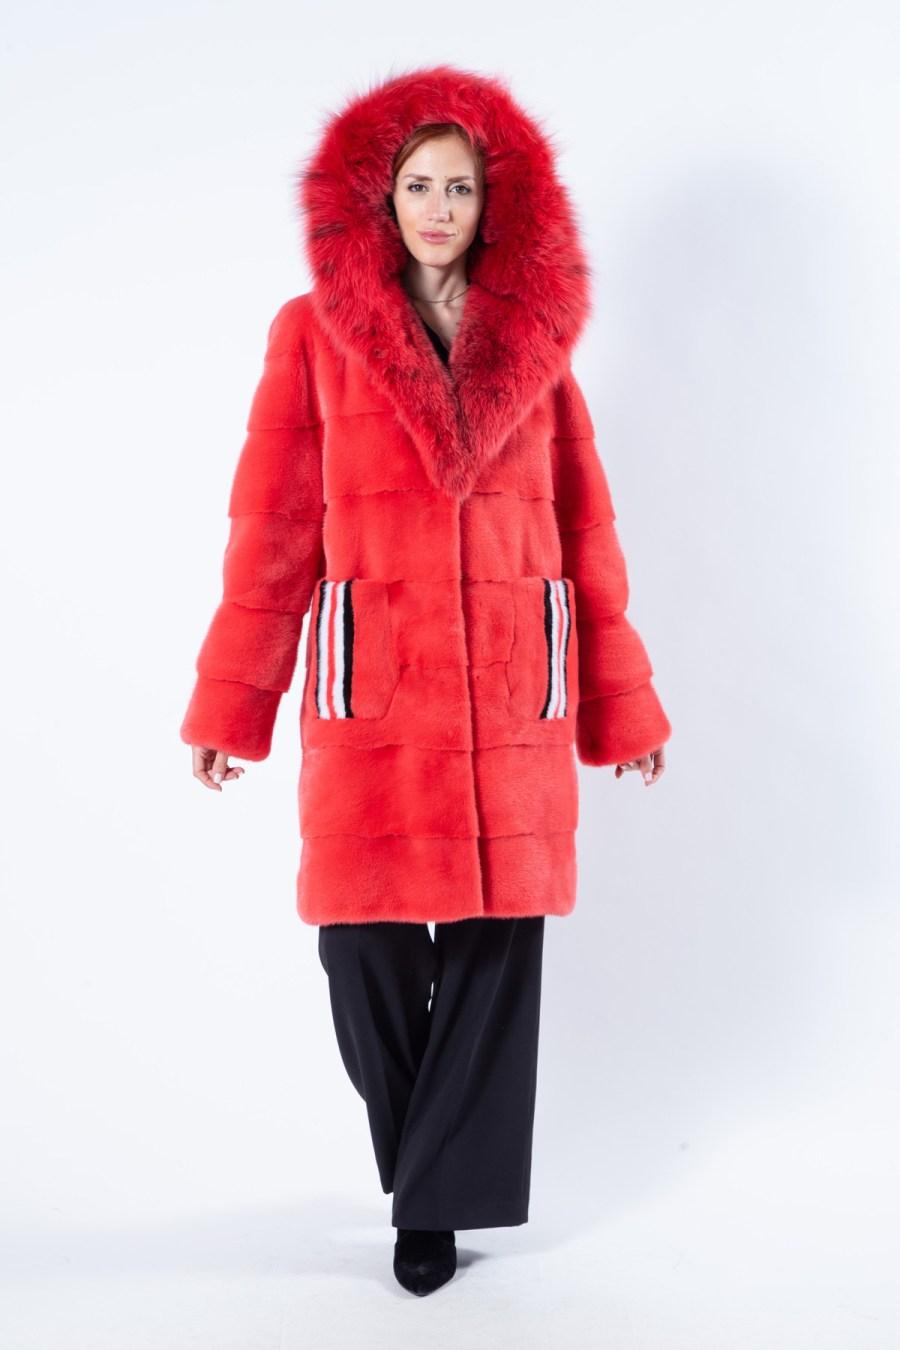 Grenadine Mink Fur Jacket with hood | Пальто из меха норки цвета Grenadine с капюшоном - Sarigianni Furs